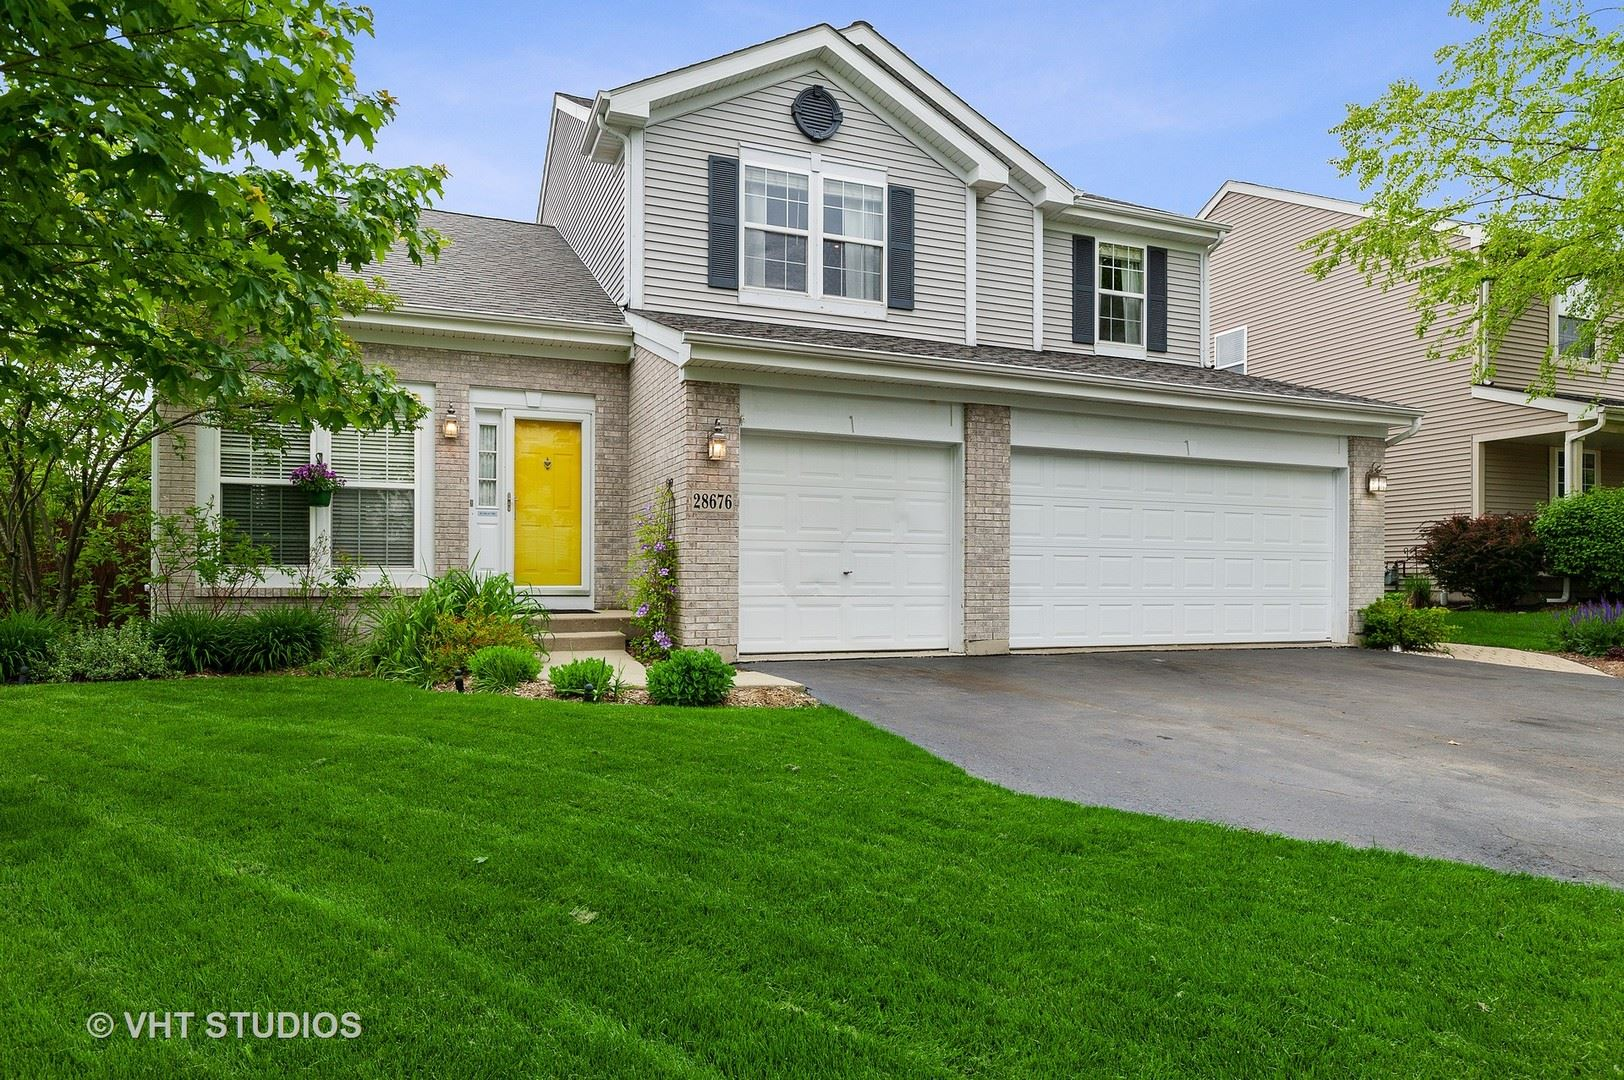 28676 W Schlesser Drive, Lakemoor, IL 60051 - #: 10734802